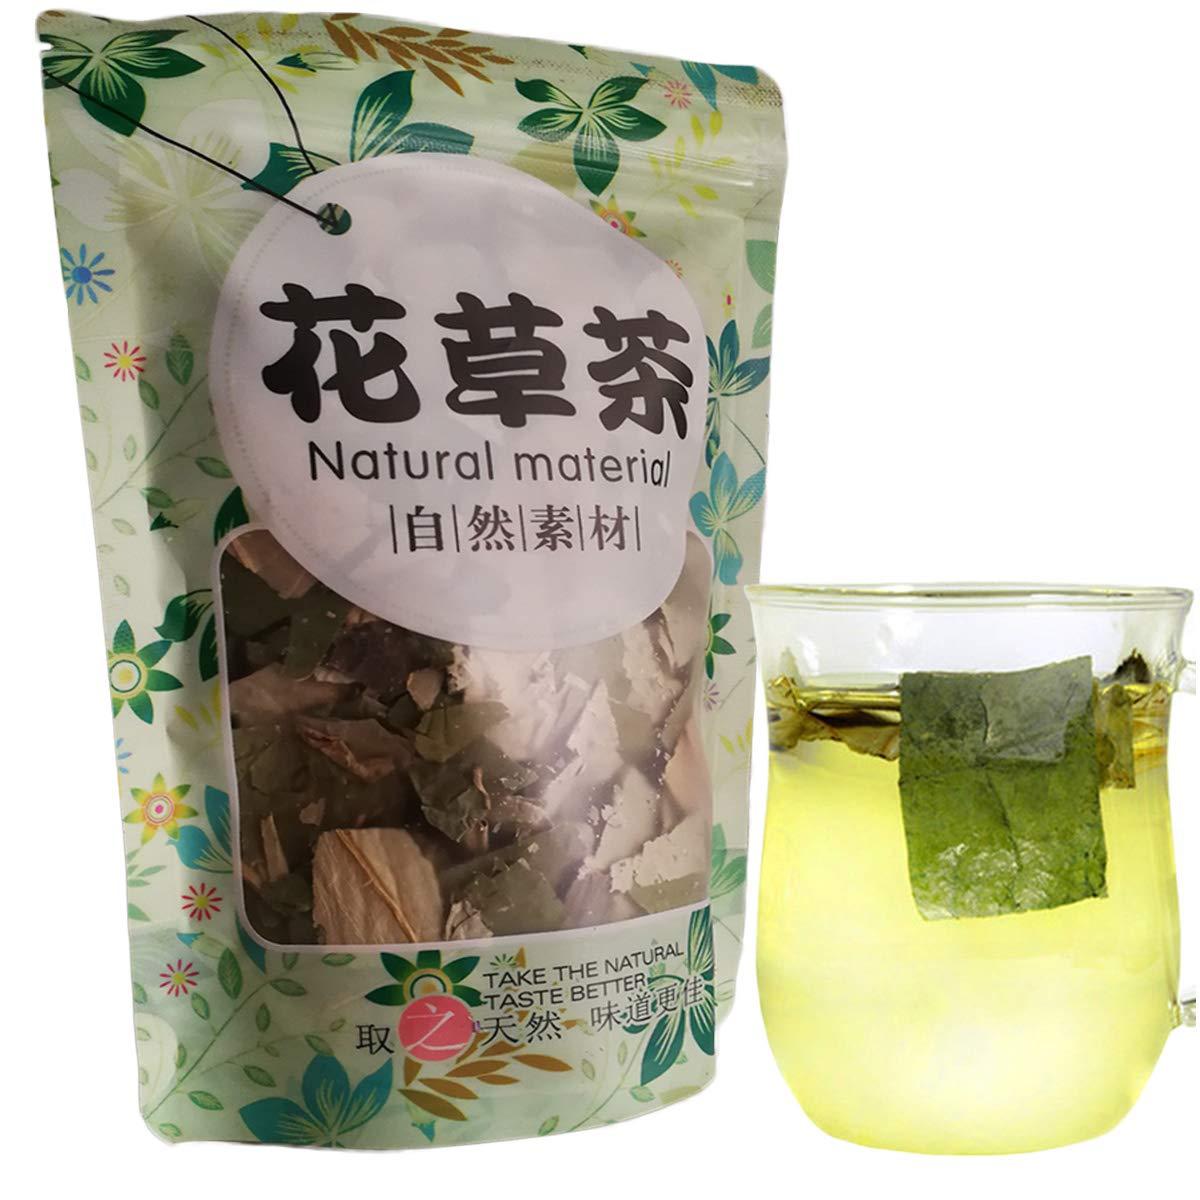 20g (0.044LB) Herb Leaf Loose Lotus Leaf Tea Traditional Herbal Tea Scented Tea Flower Tea Botanical Tea Herbs Tea Green Tea Raw Tea Sheng cha Green Food Flowers Tea Health Tea Chinese Tea